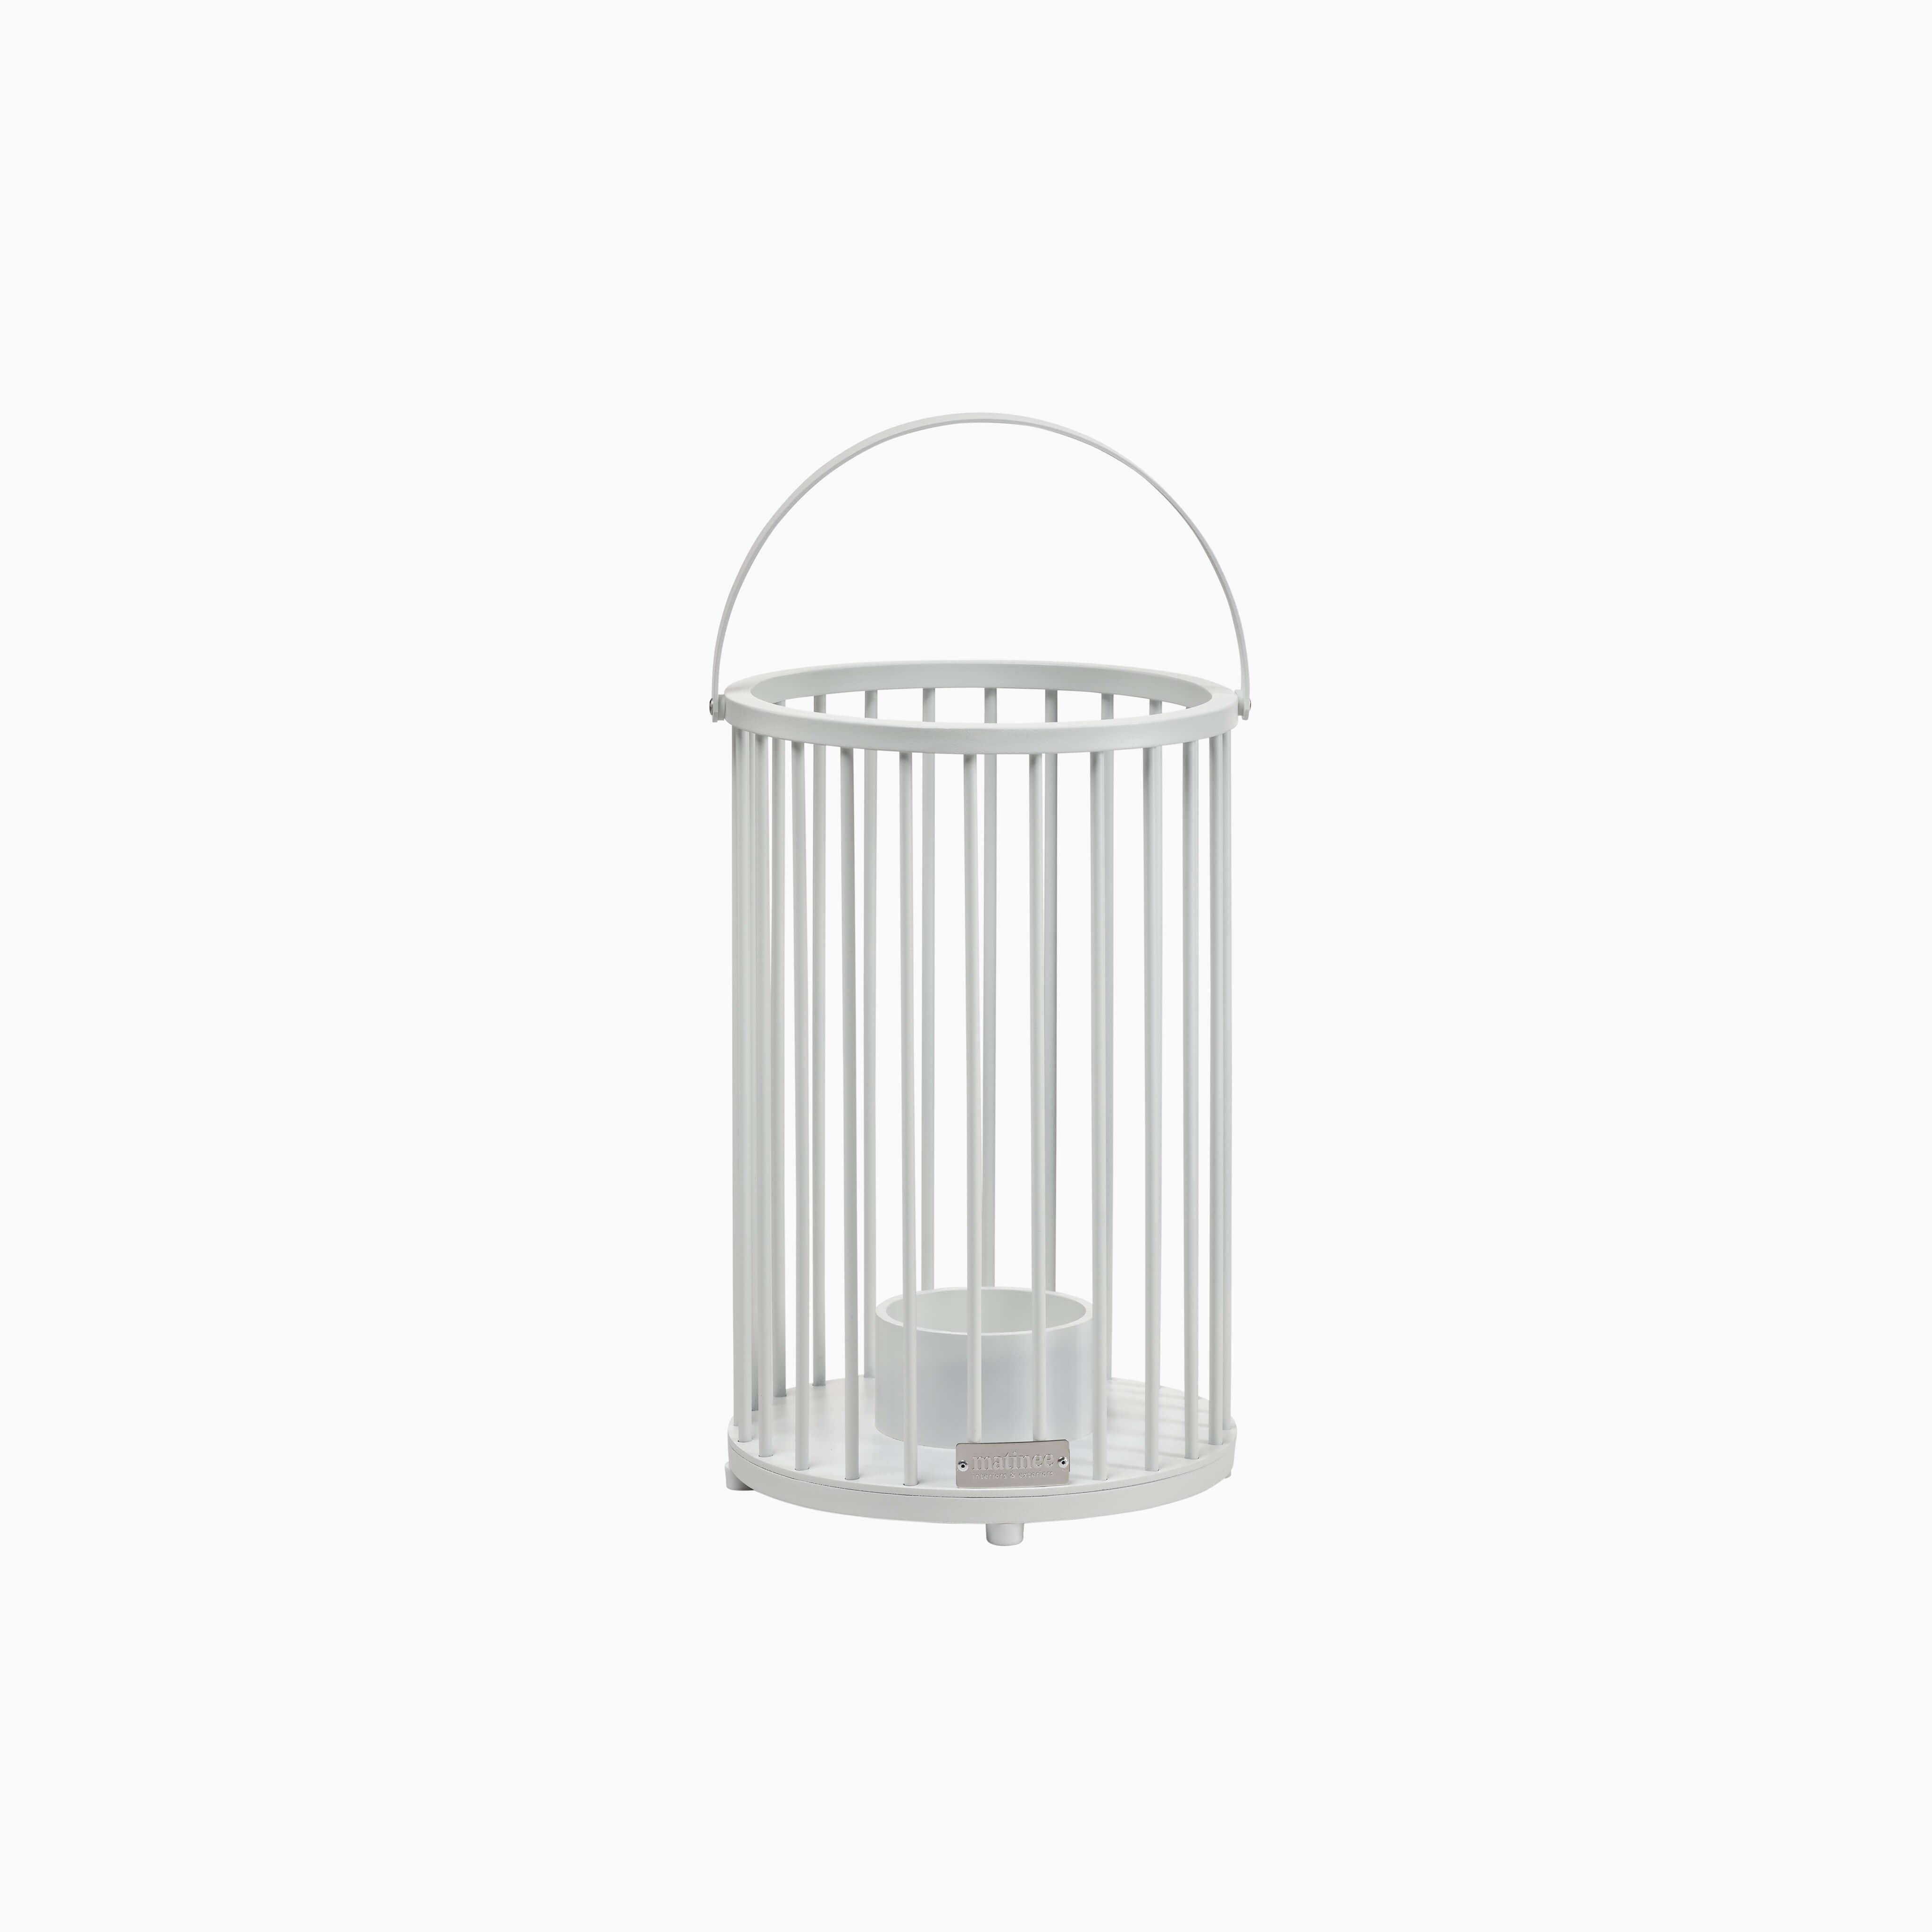 Nature light - M - Weiß